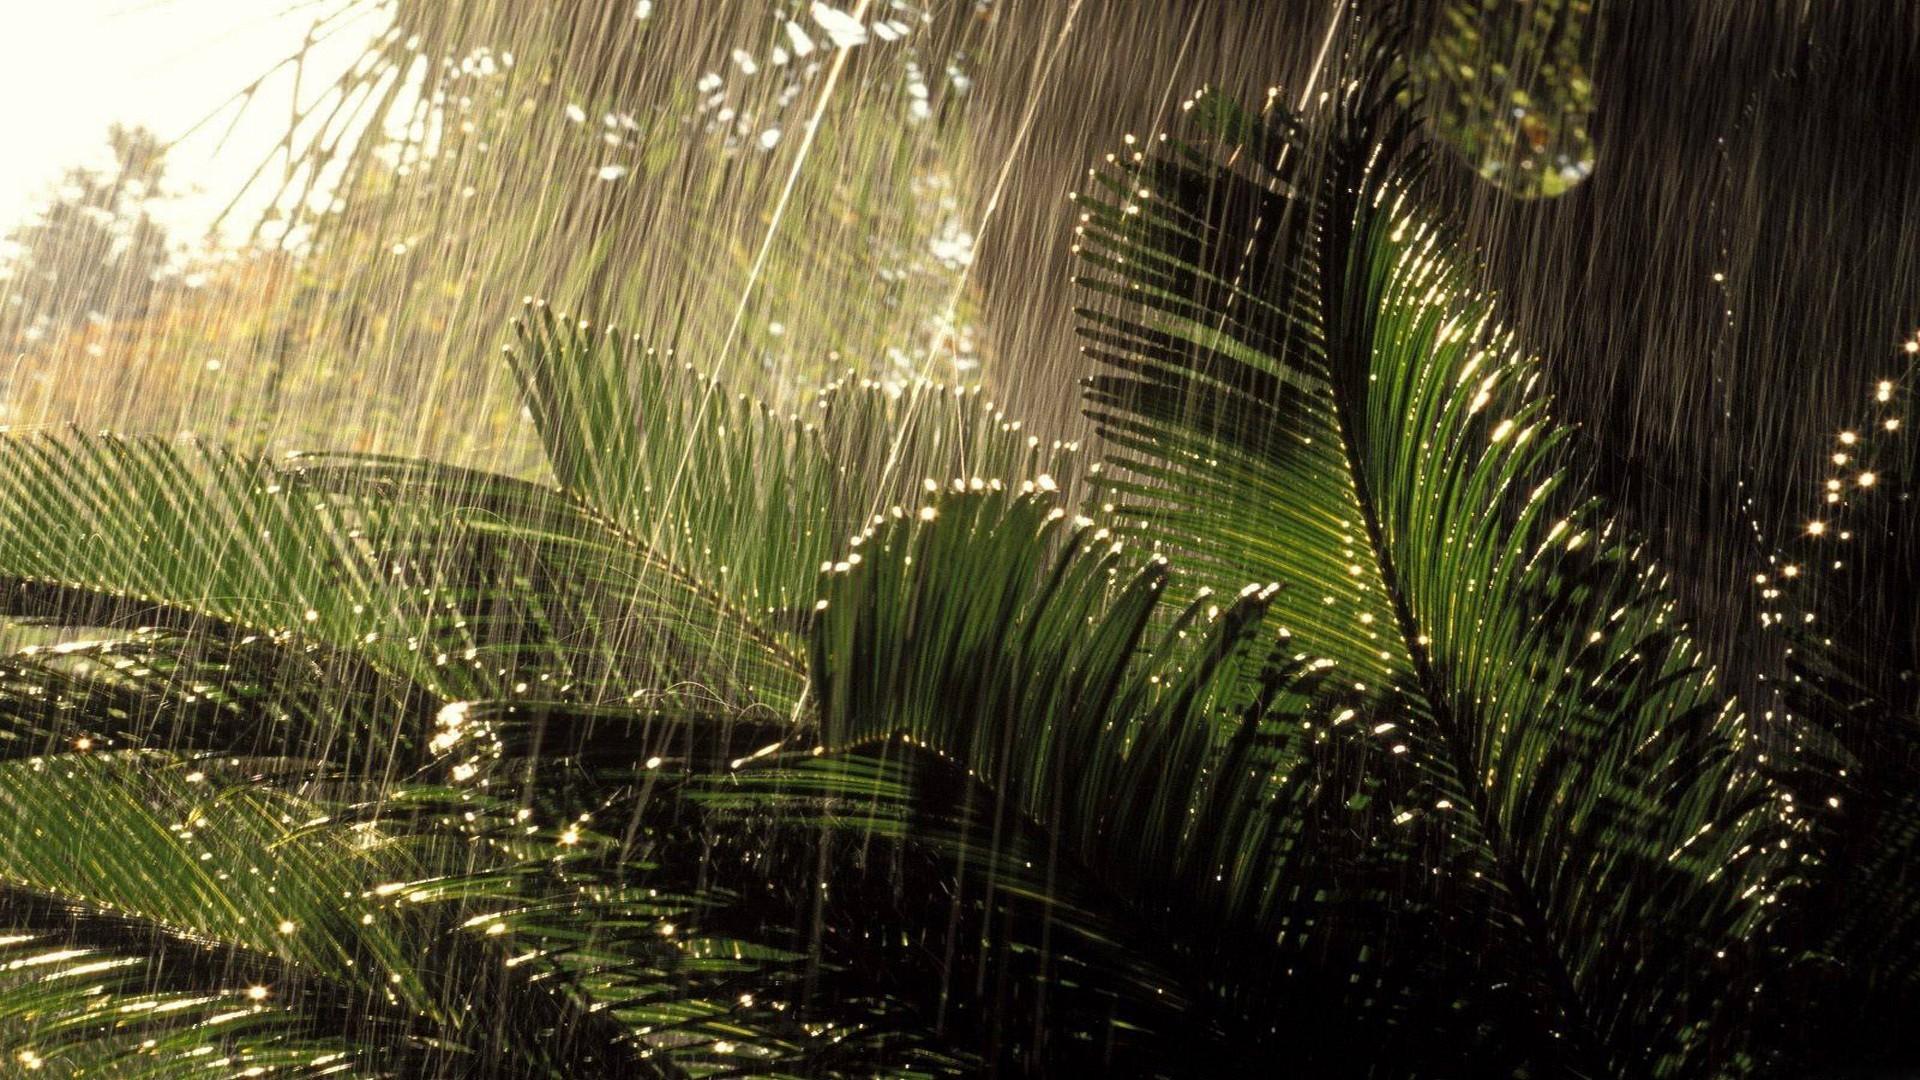 rain hd wallpaper